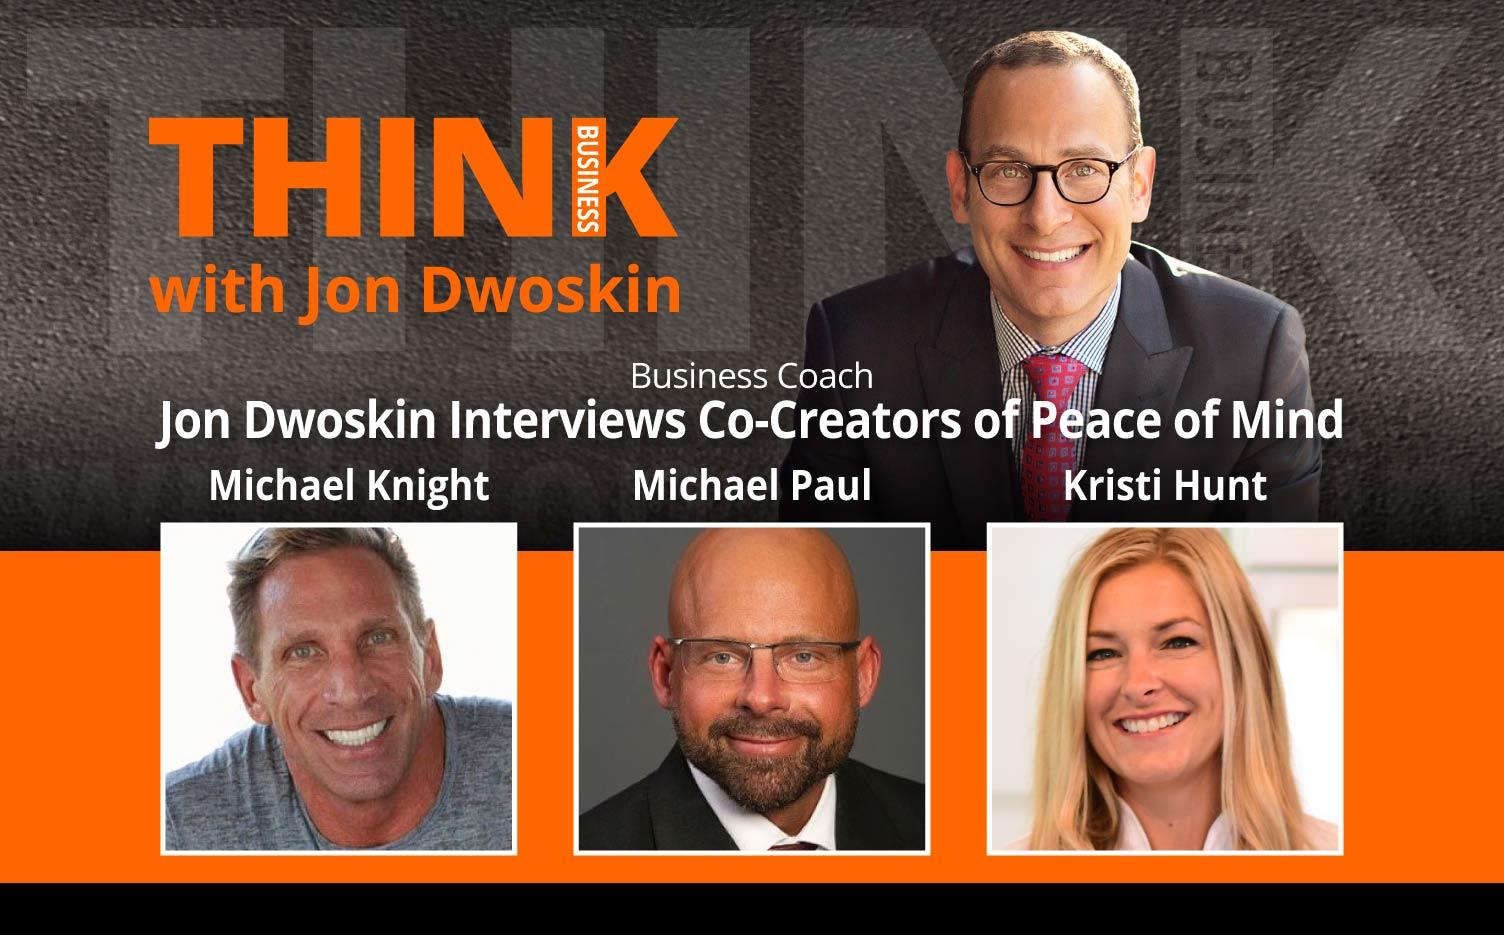 THINK Business Podcast: Jon Dwoskin Interviews Michael Knight, Michael Paul and Kristi Hunt, Co-Creators of Peace of Mind